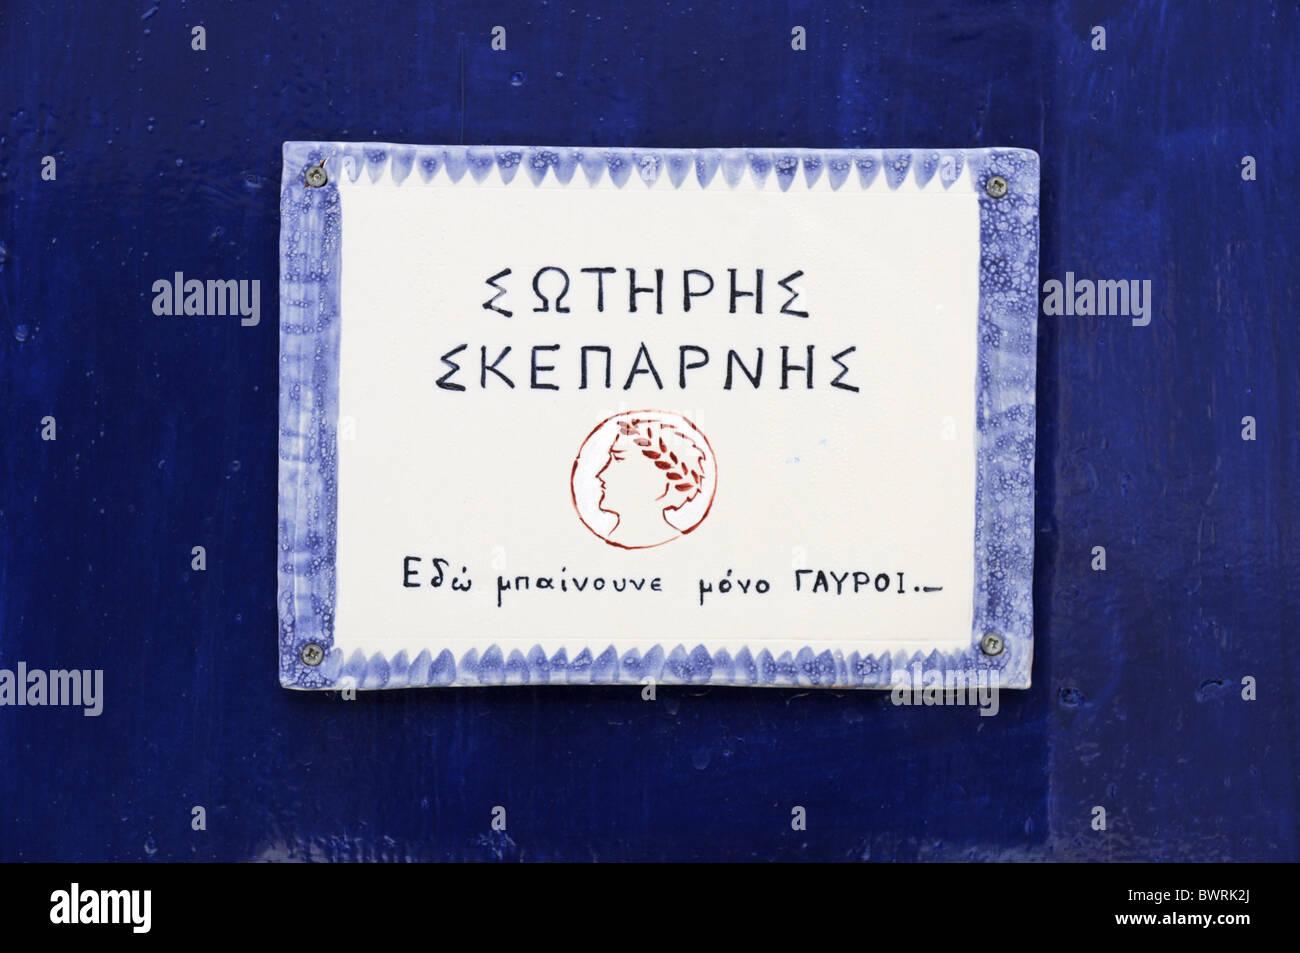 Ceramic house sign on Greek language in Crete, Greece - Stock Image